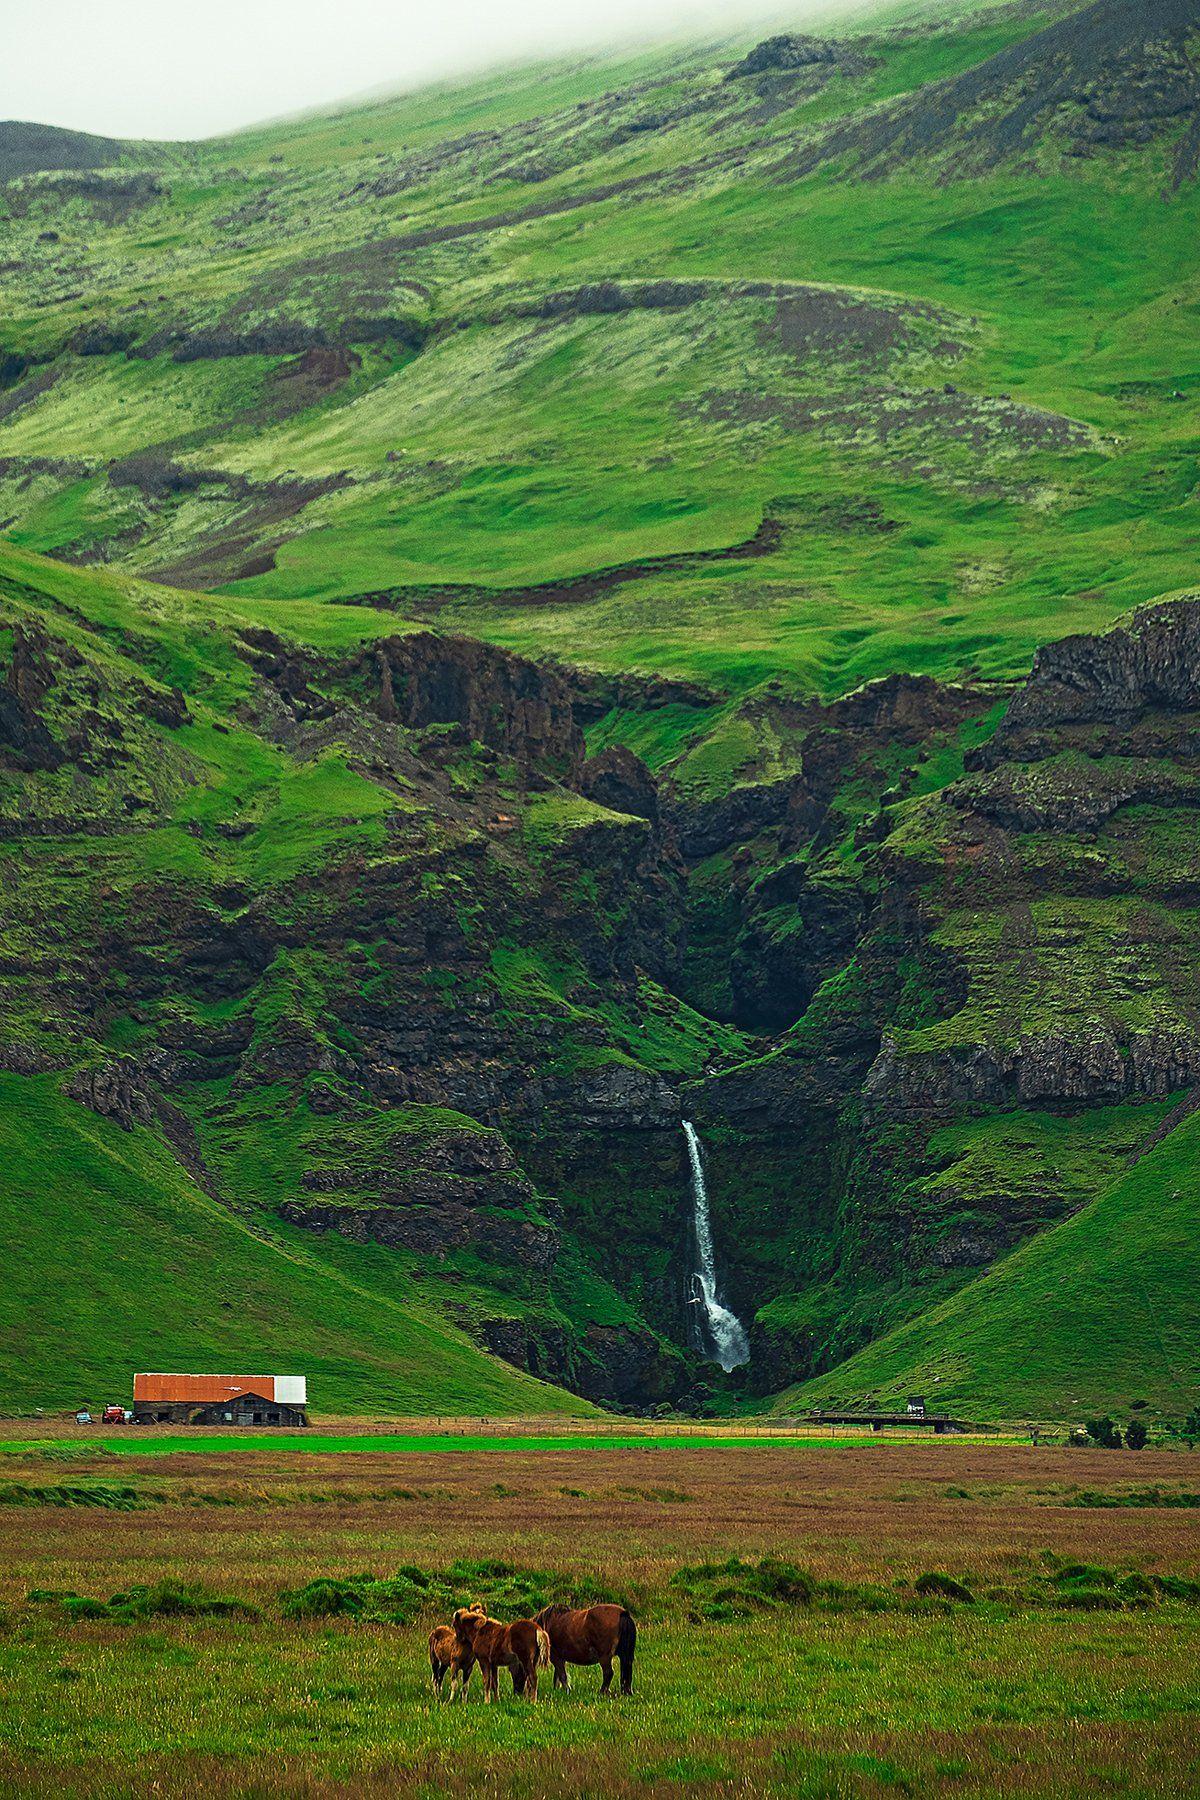 iceland, waterfall, horse, исландия, водопад, лошадь., Владимир В. Эделев